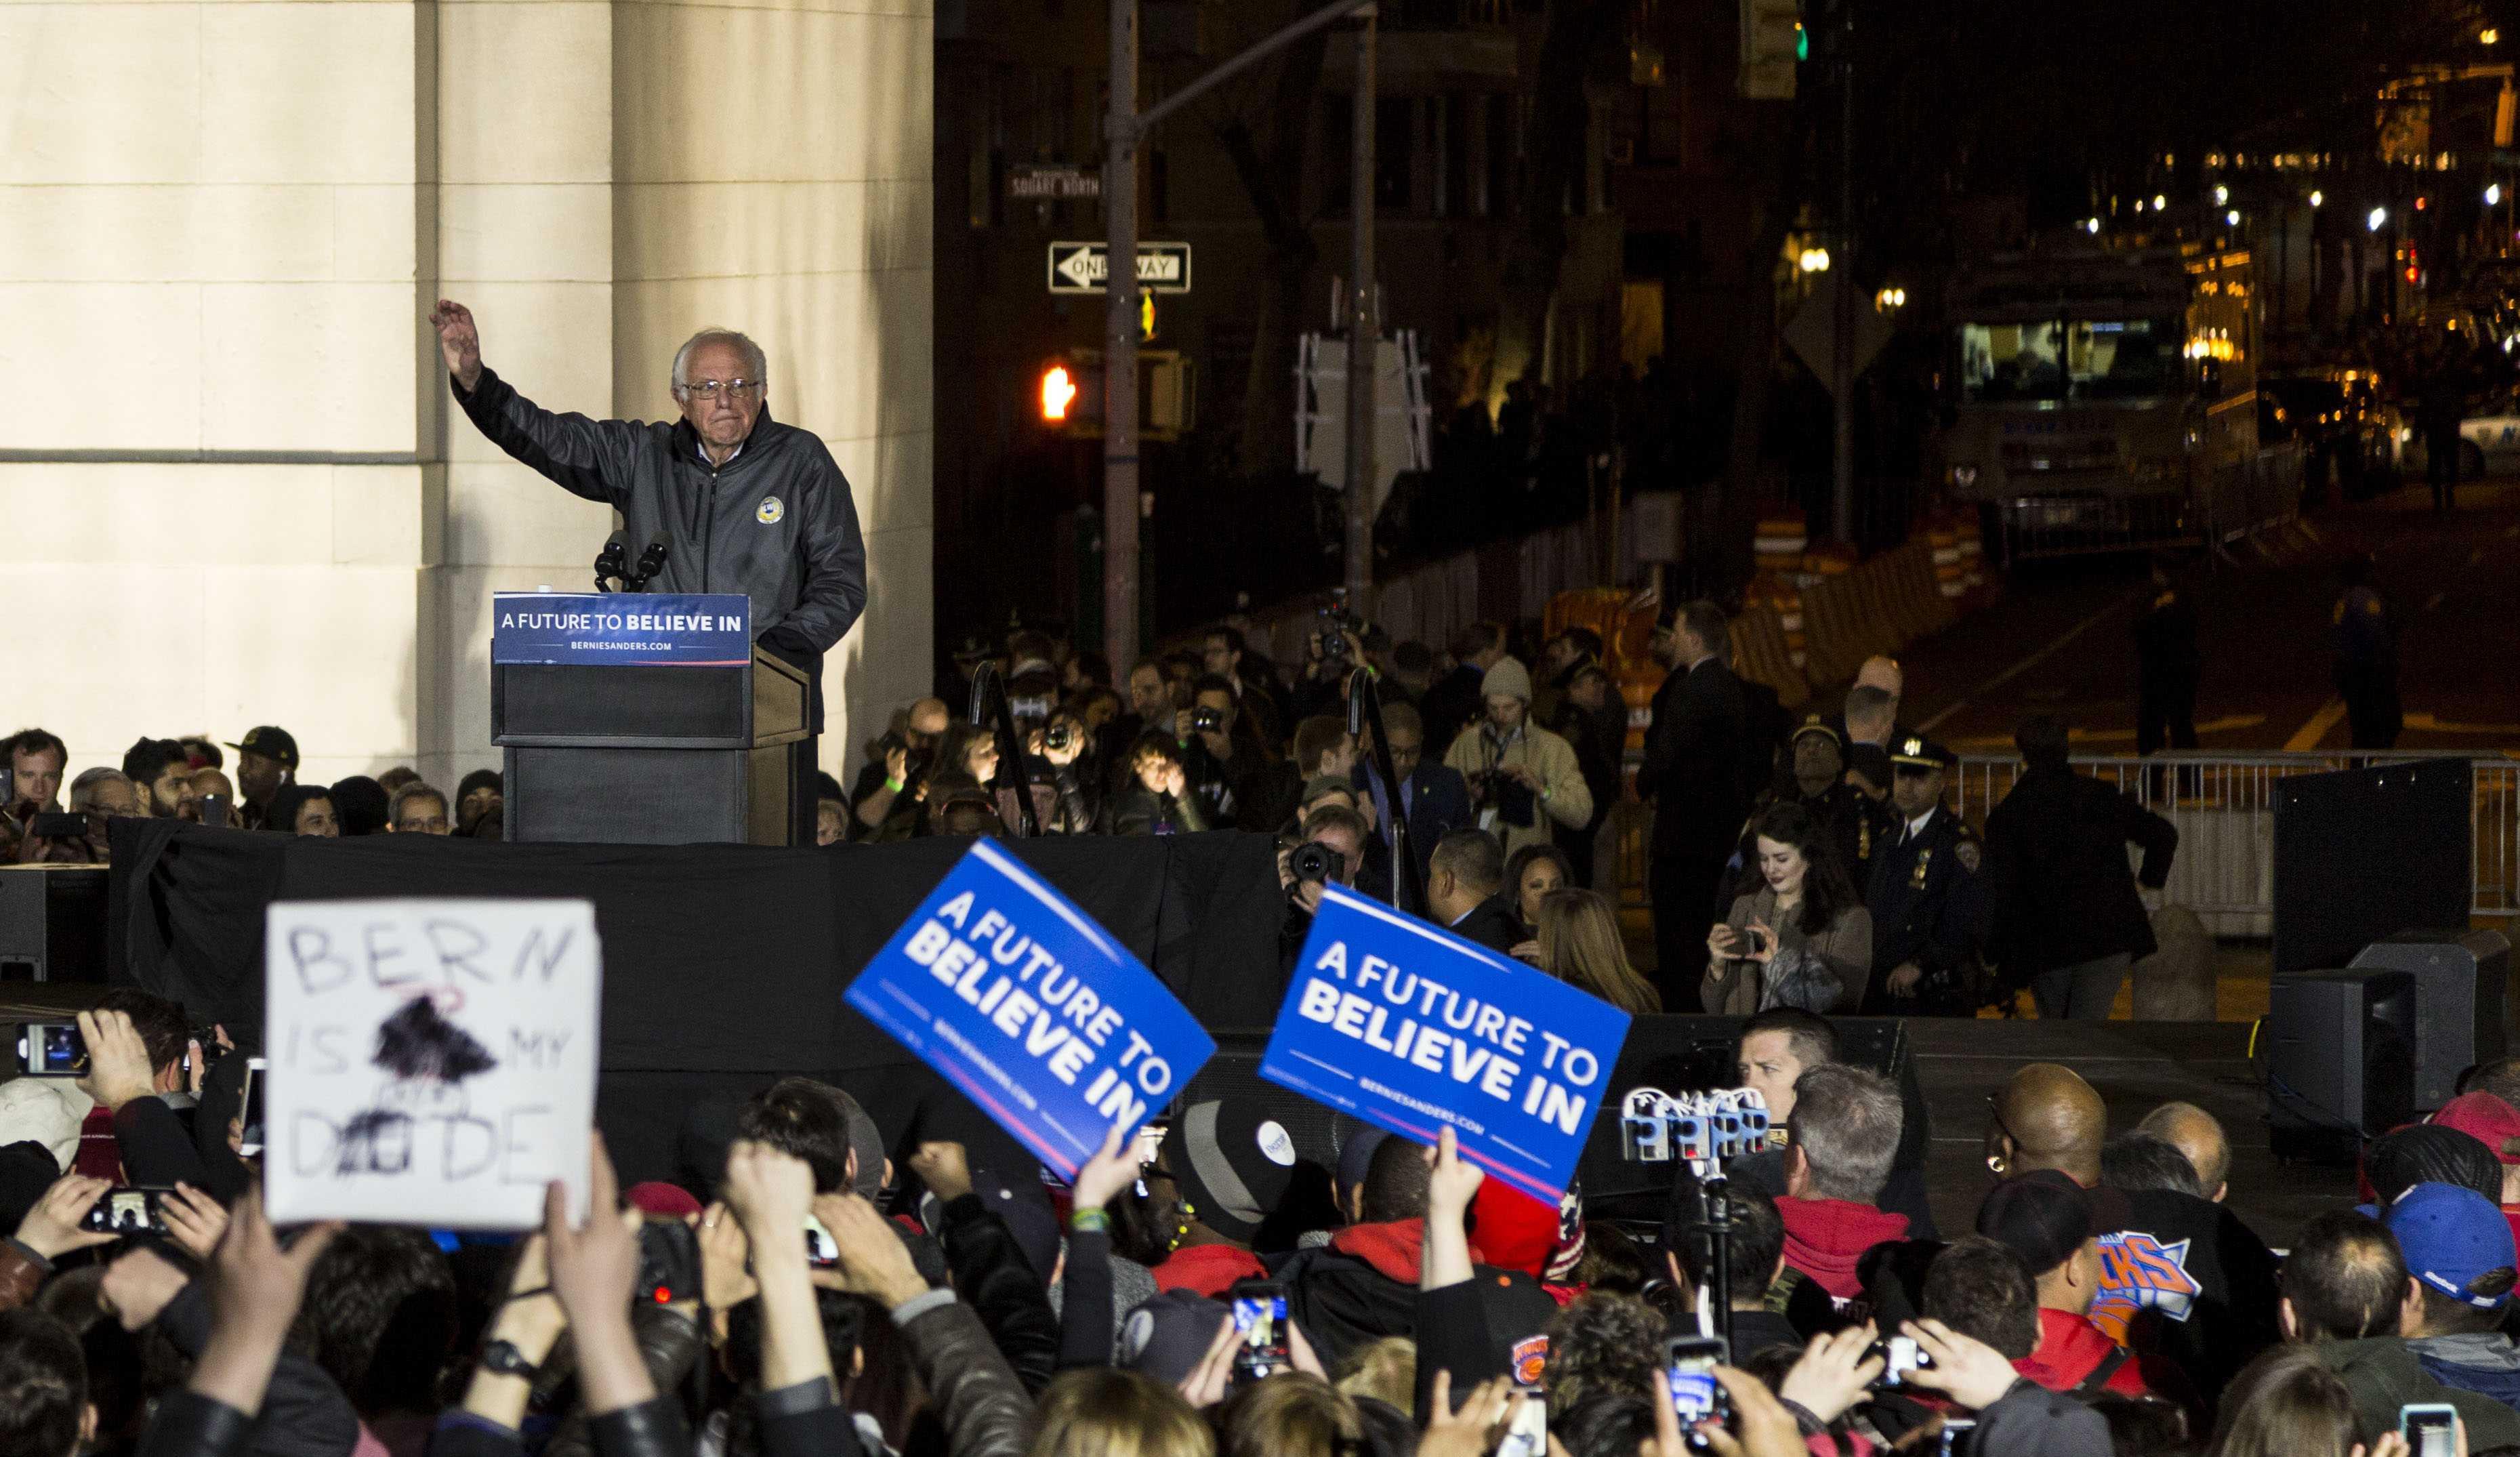 Senator Bernie Sanders spoke for 90 minutes at the rally last Wednesday in Washington Square Park.